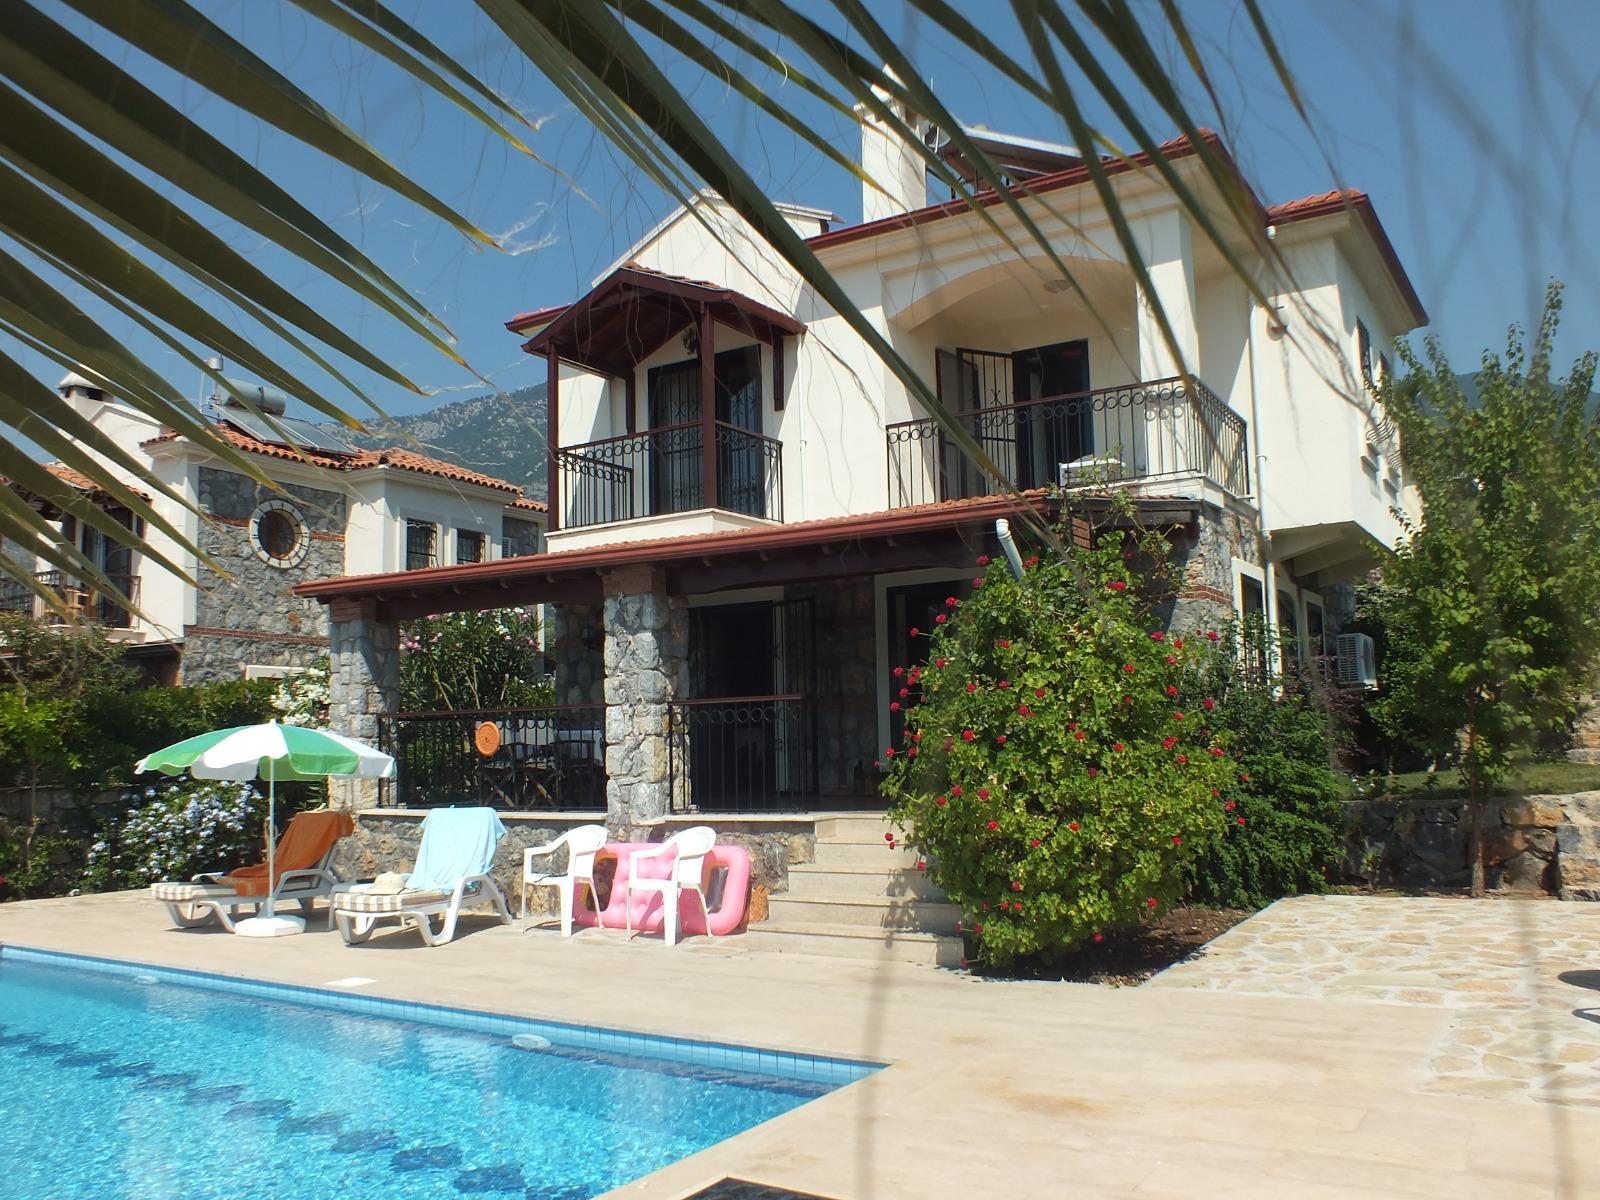 3 bedroomed 3 bathroom  furnished duplex villa – Fethiye, Ovacik